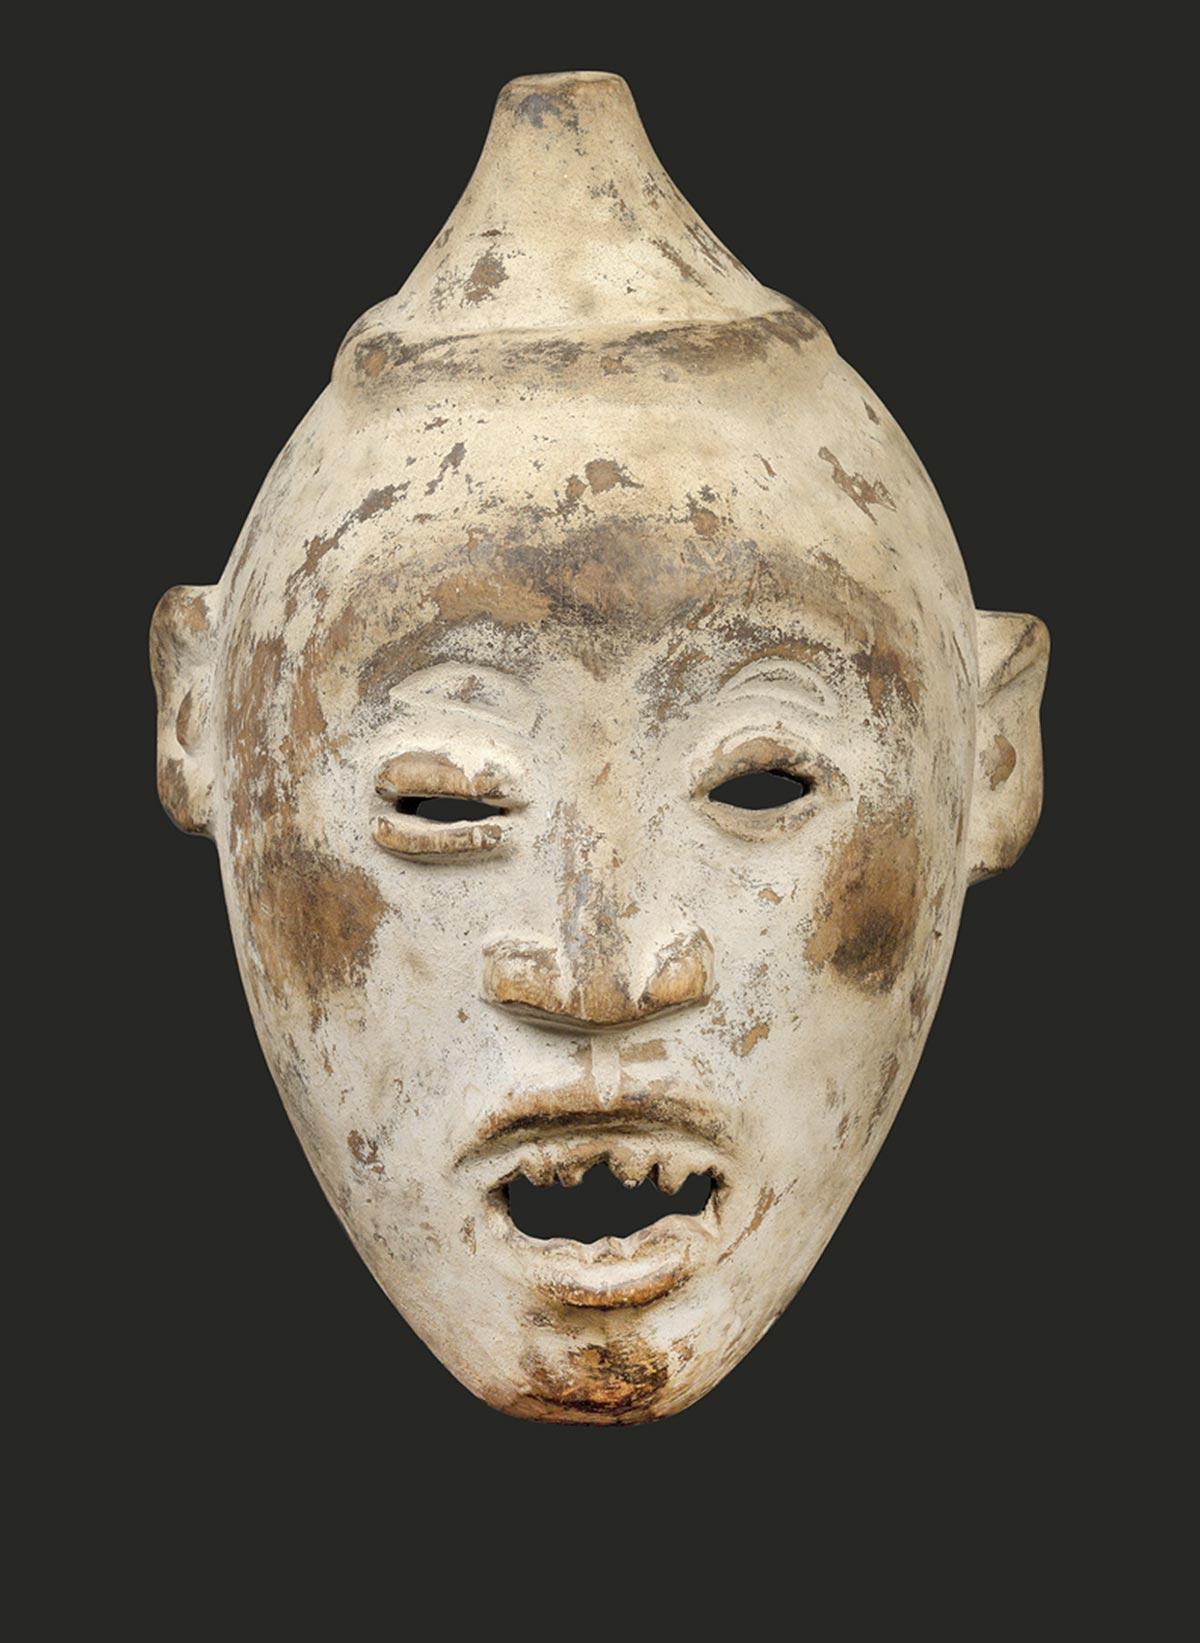 Vili/Yombe-Maske | ARGUS Art Asset Austria, Wien